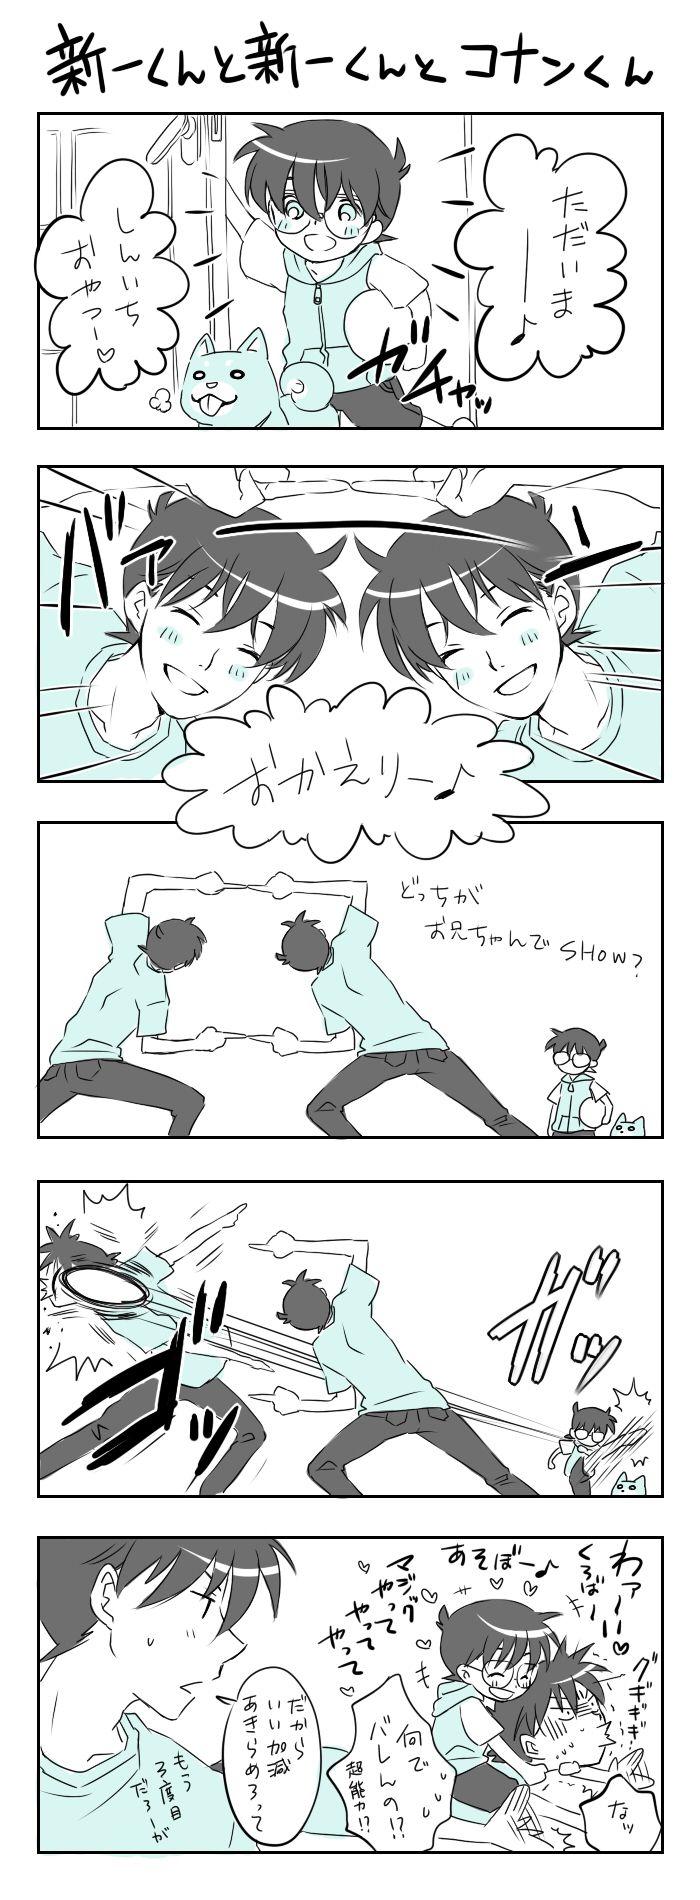 Shinichi-kun and Shinichi-kun and Conan-kun [brothers set]